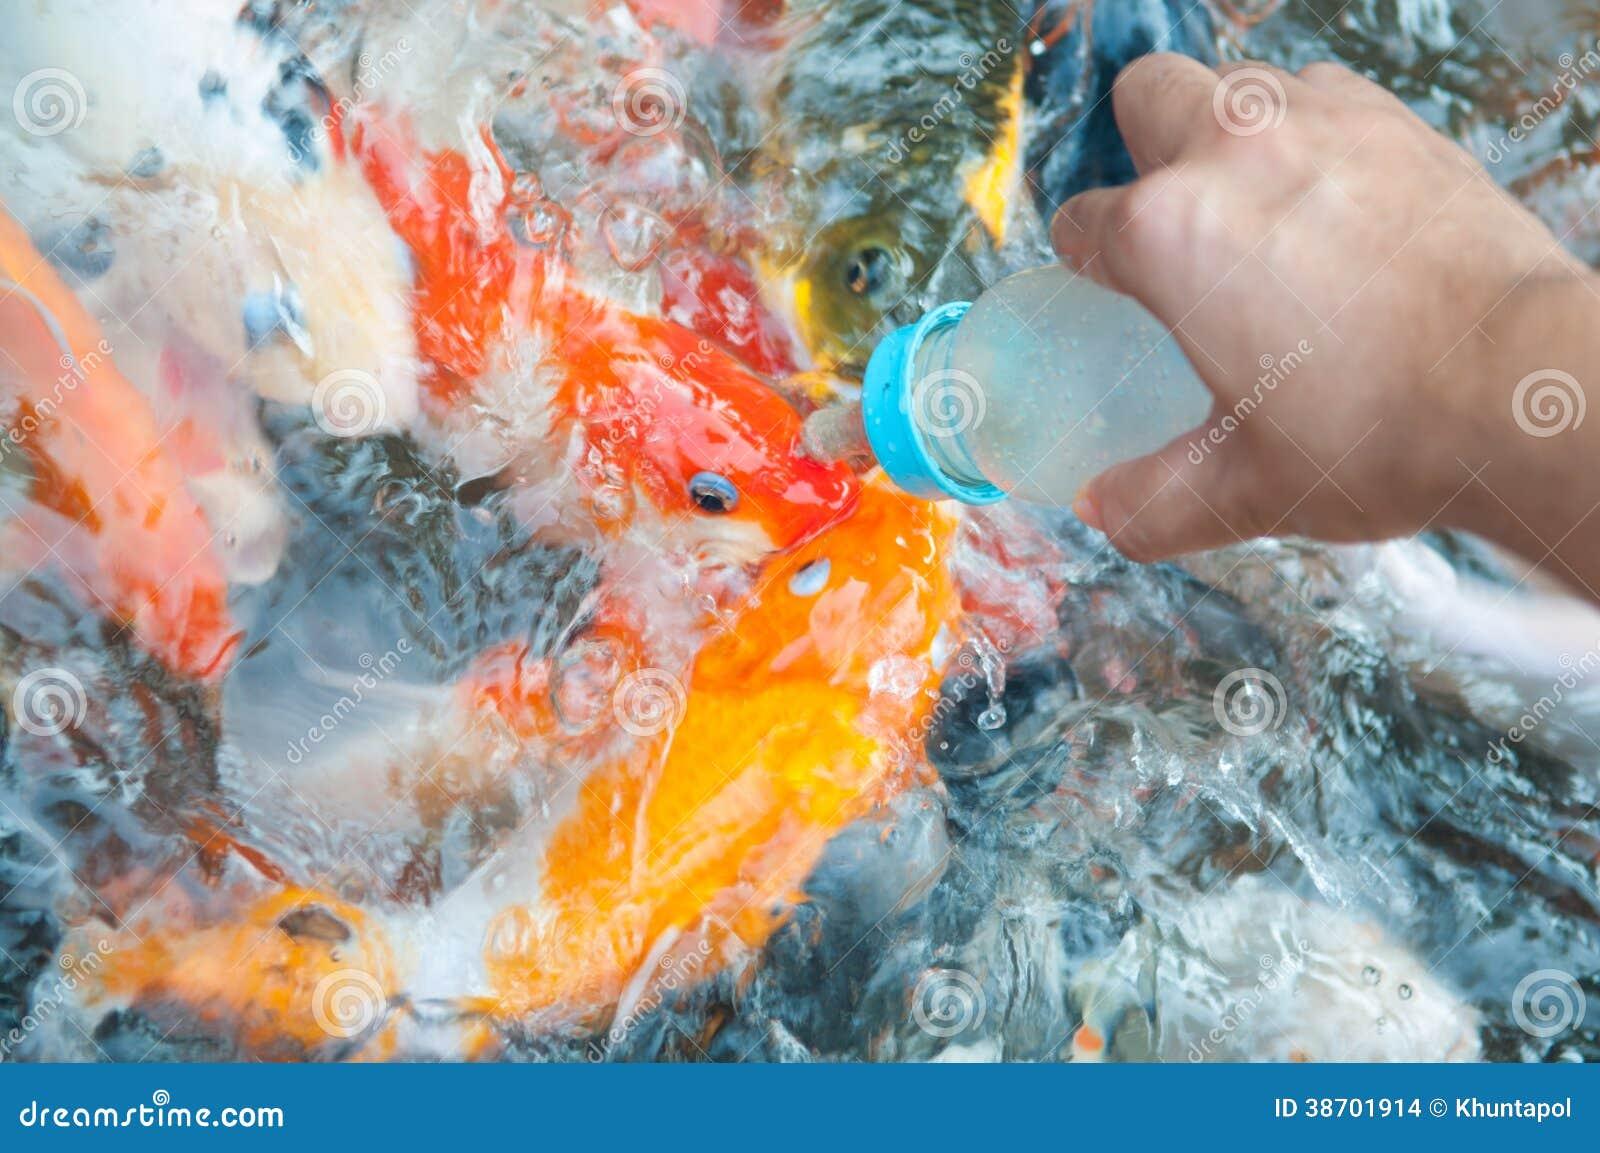 Feeding koi fish with milk bottle stock images image for Feeding koi fish